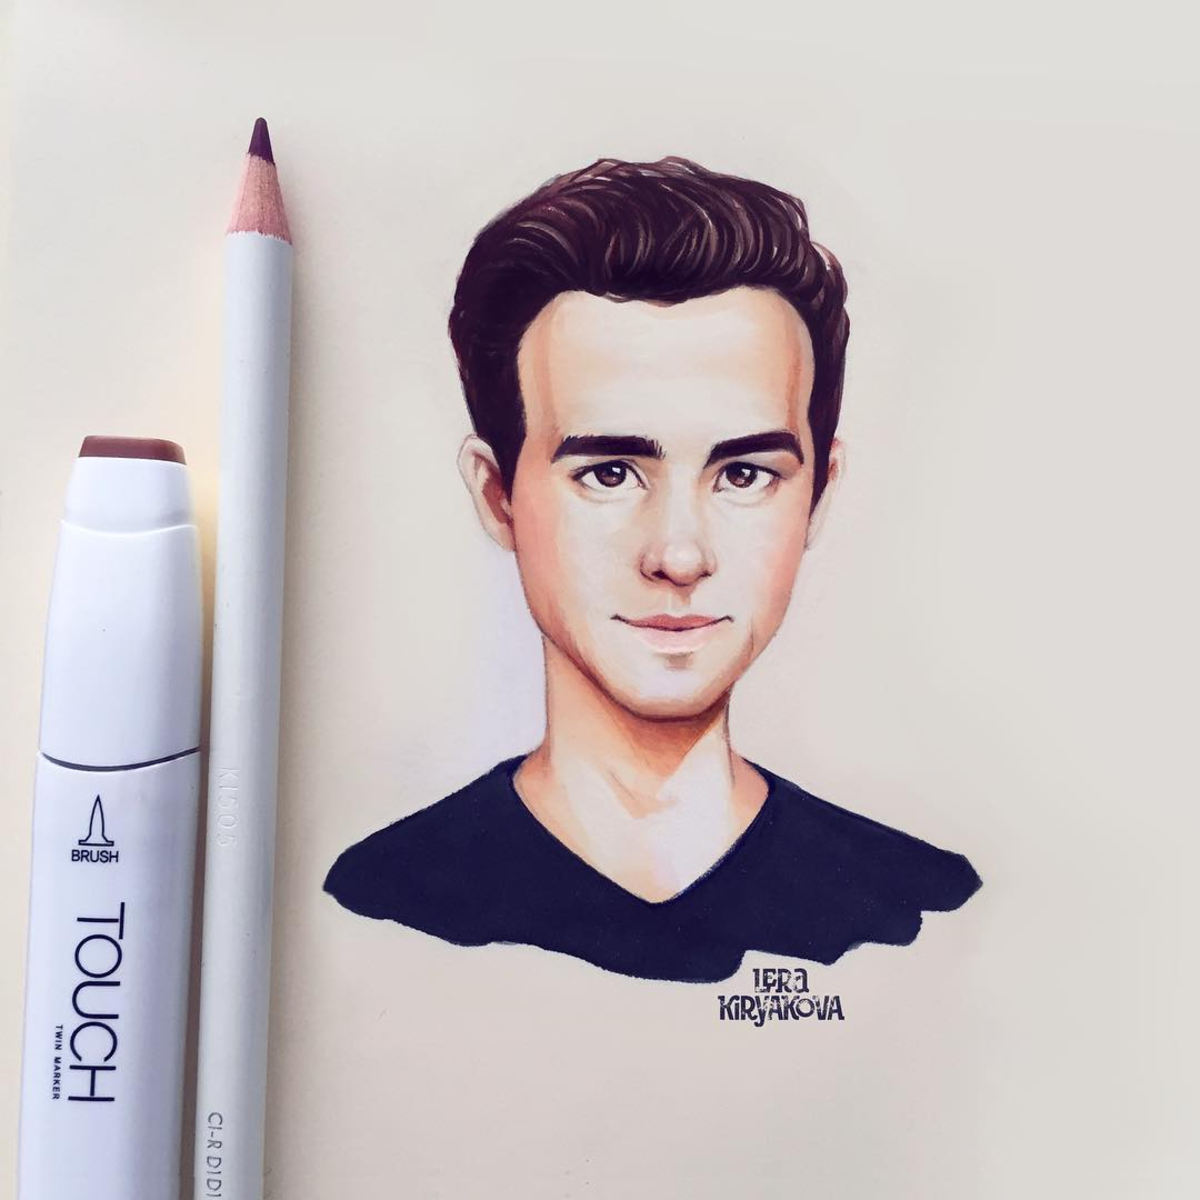 Ryan Reynolds By Lera Kiryakova Celebrities Pinterest Ryan - Russian artist draws amazing cartoon versions of famous celebrities